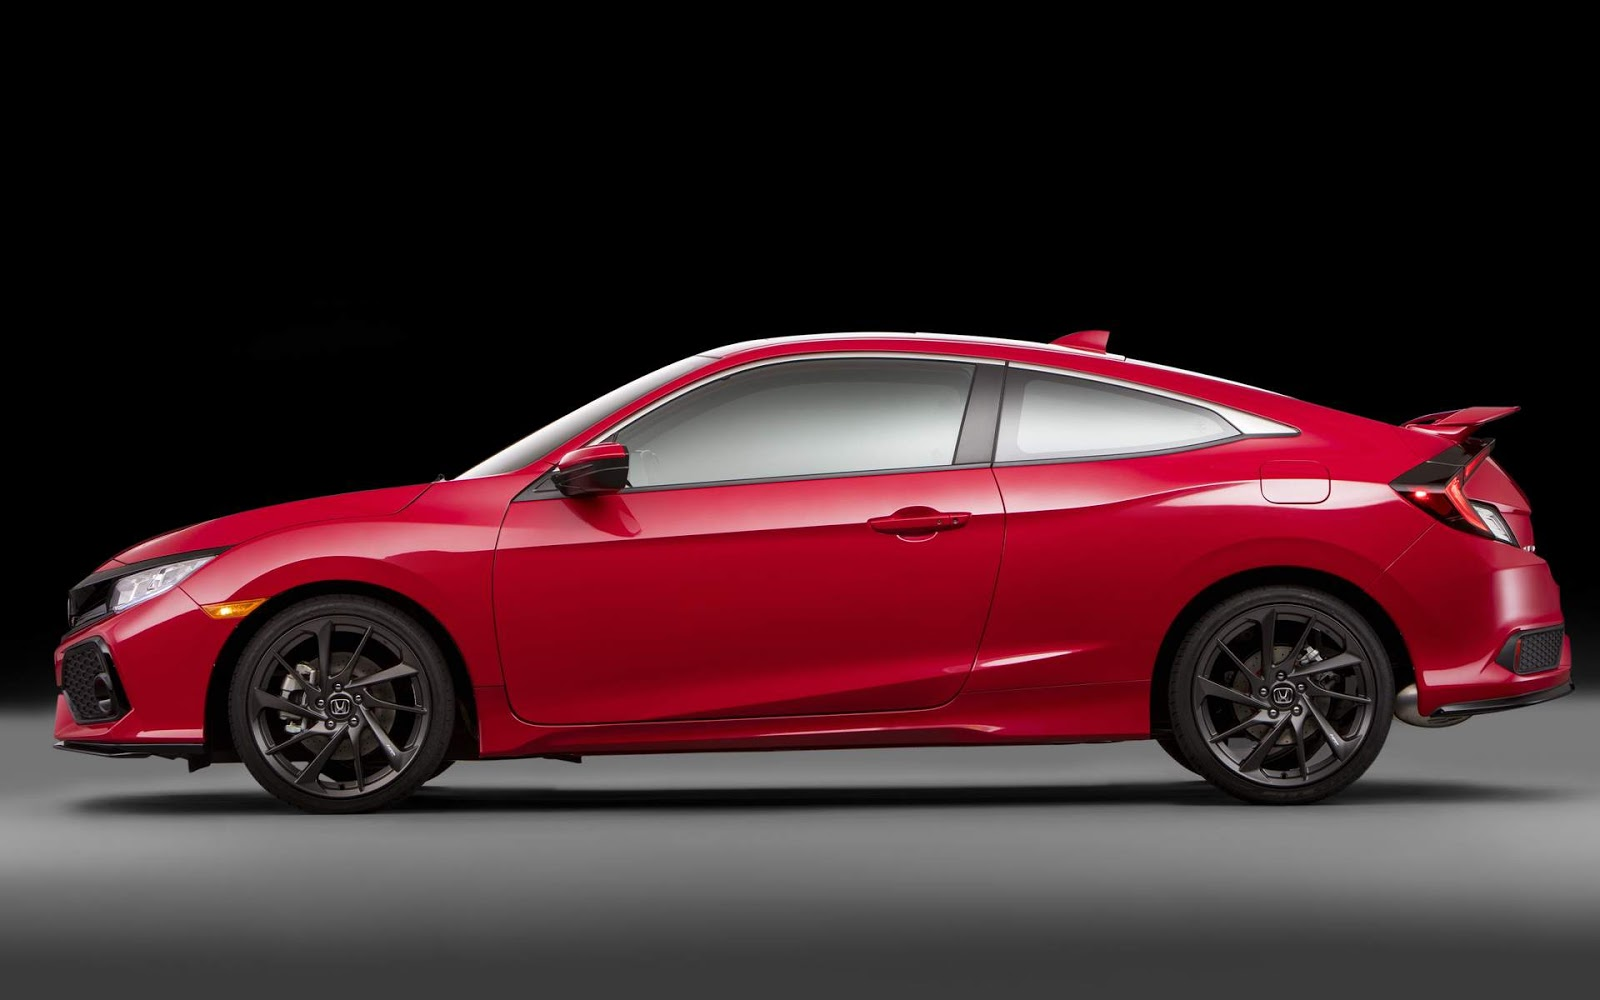 Honda civic si 2018 torque revelado motor v cio for 2018 honda civic si price